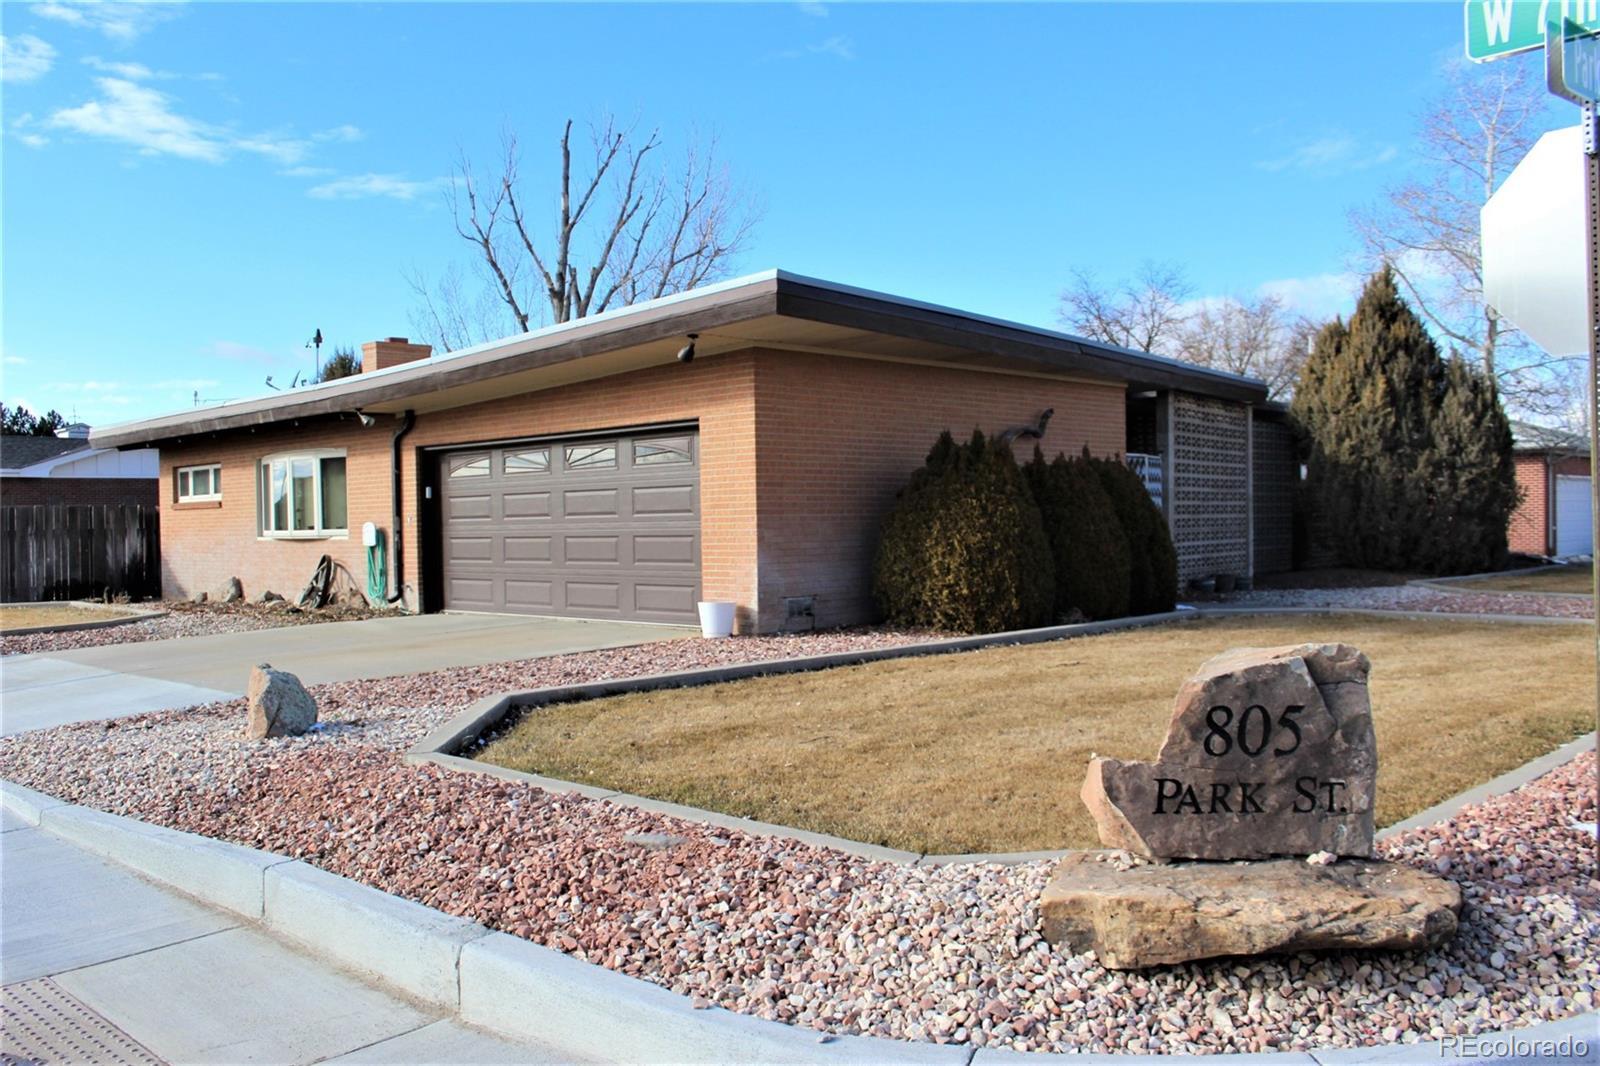 805 Park Street, Fort Morgan, CO 80701 - Fort Morgan, CO real estate listing